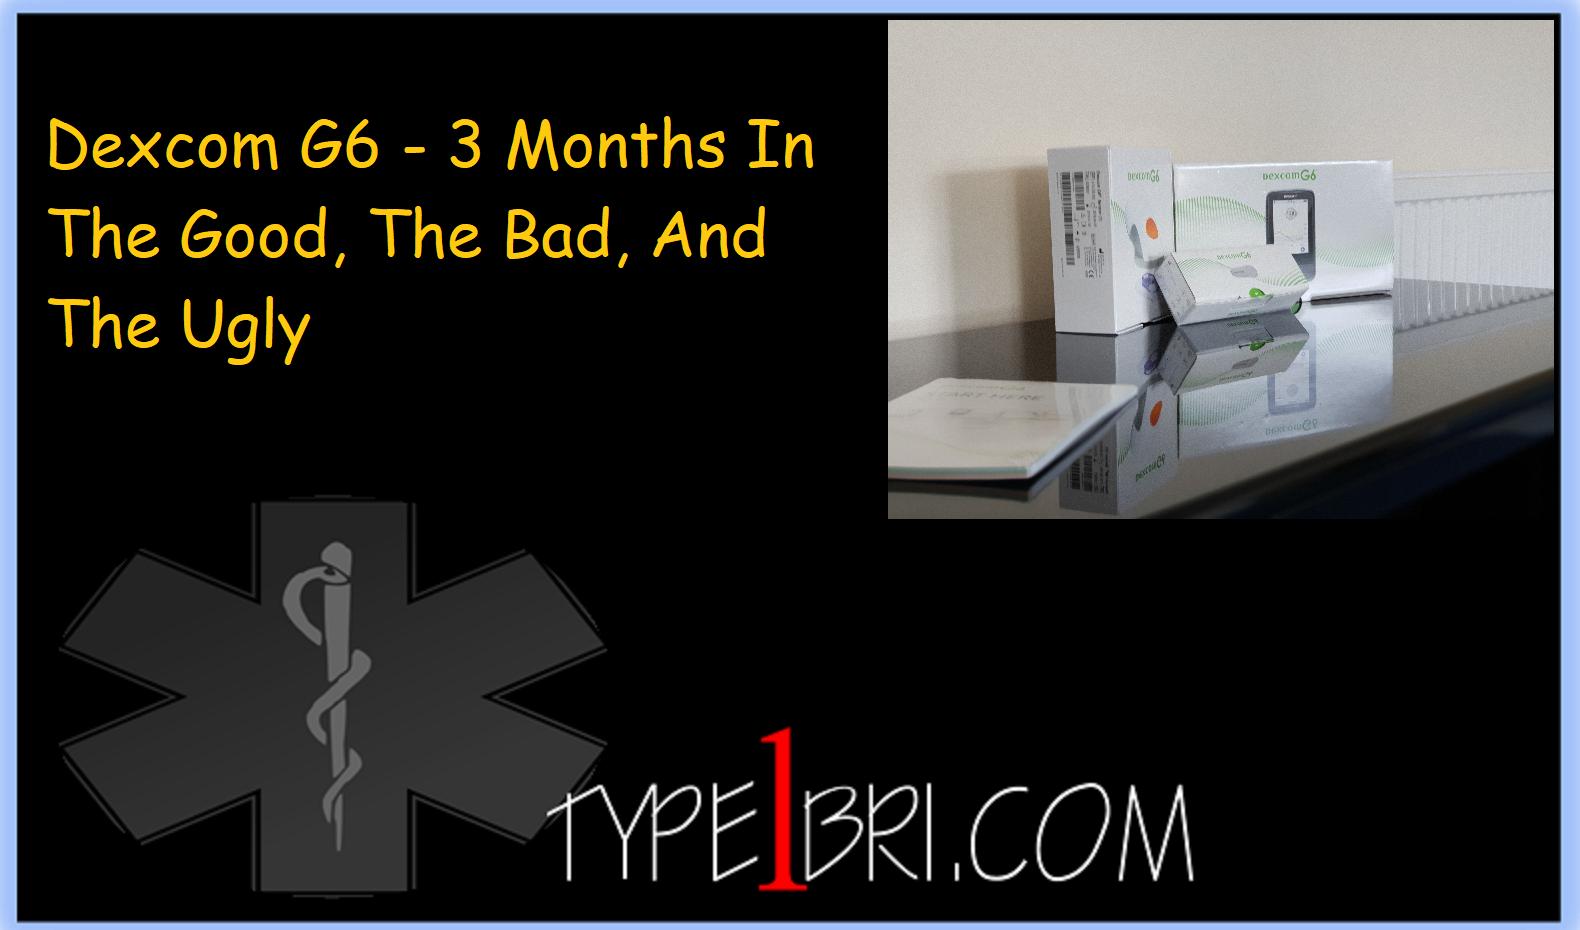 Dexcom G6 - 3 Months In - Type1Bri com - A Diabetic Blog